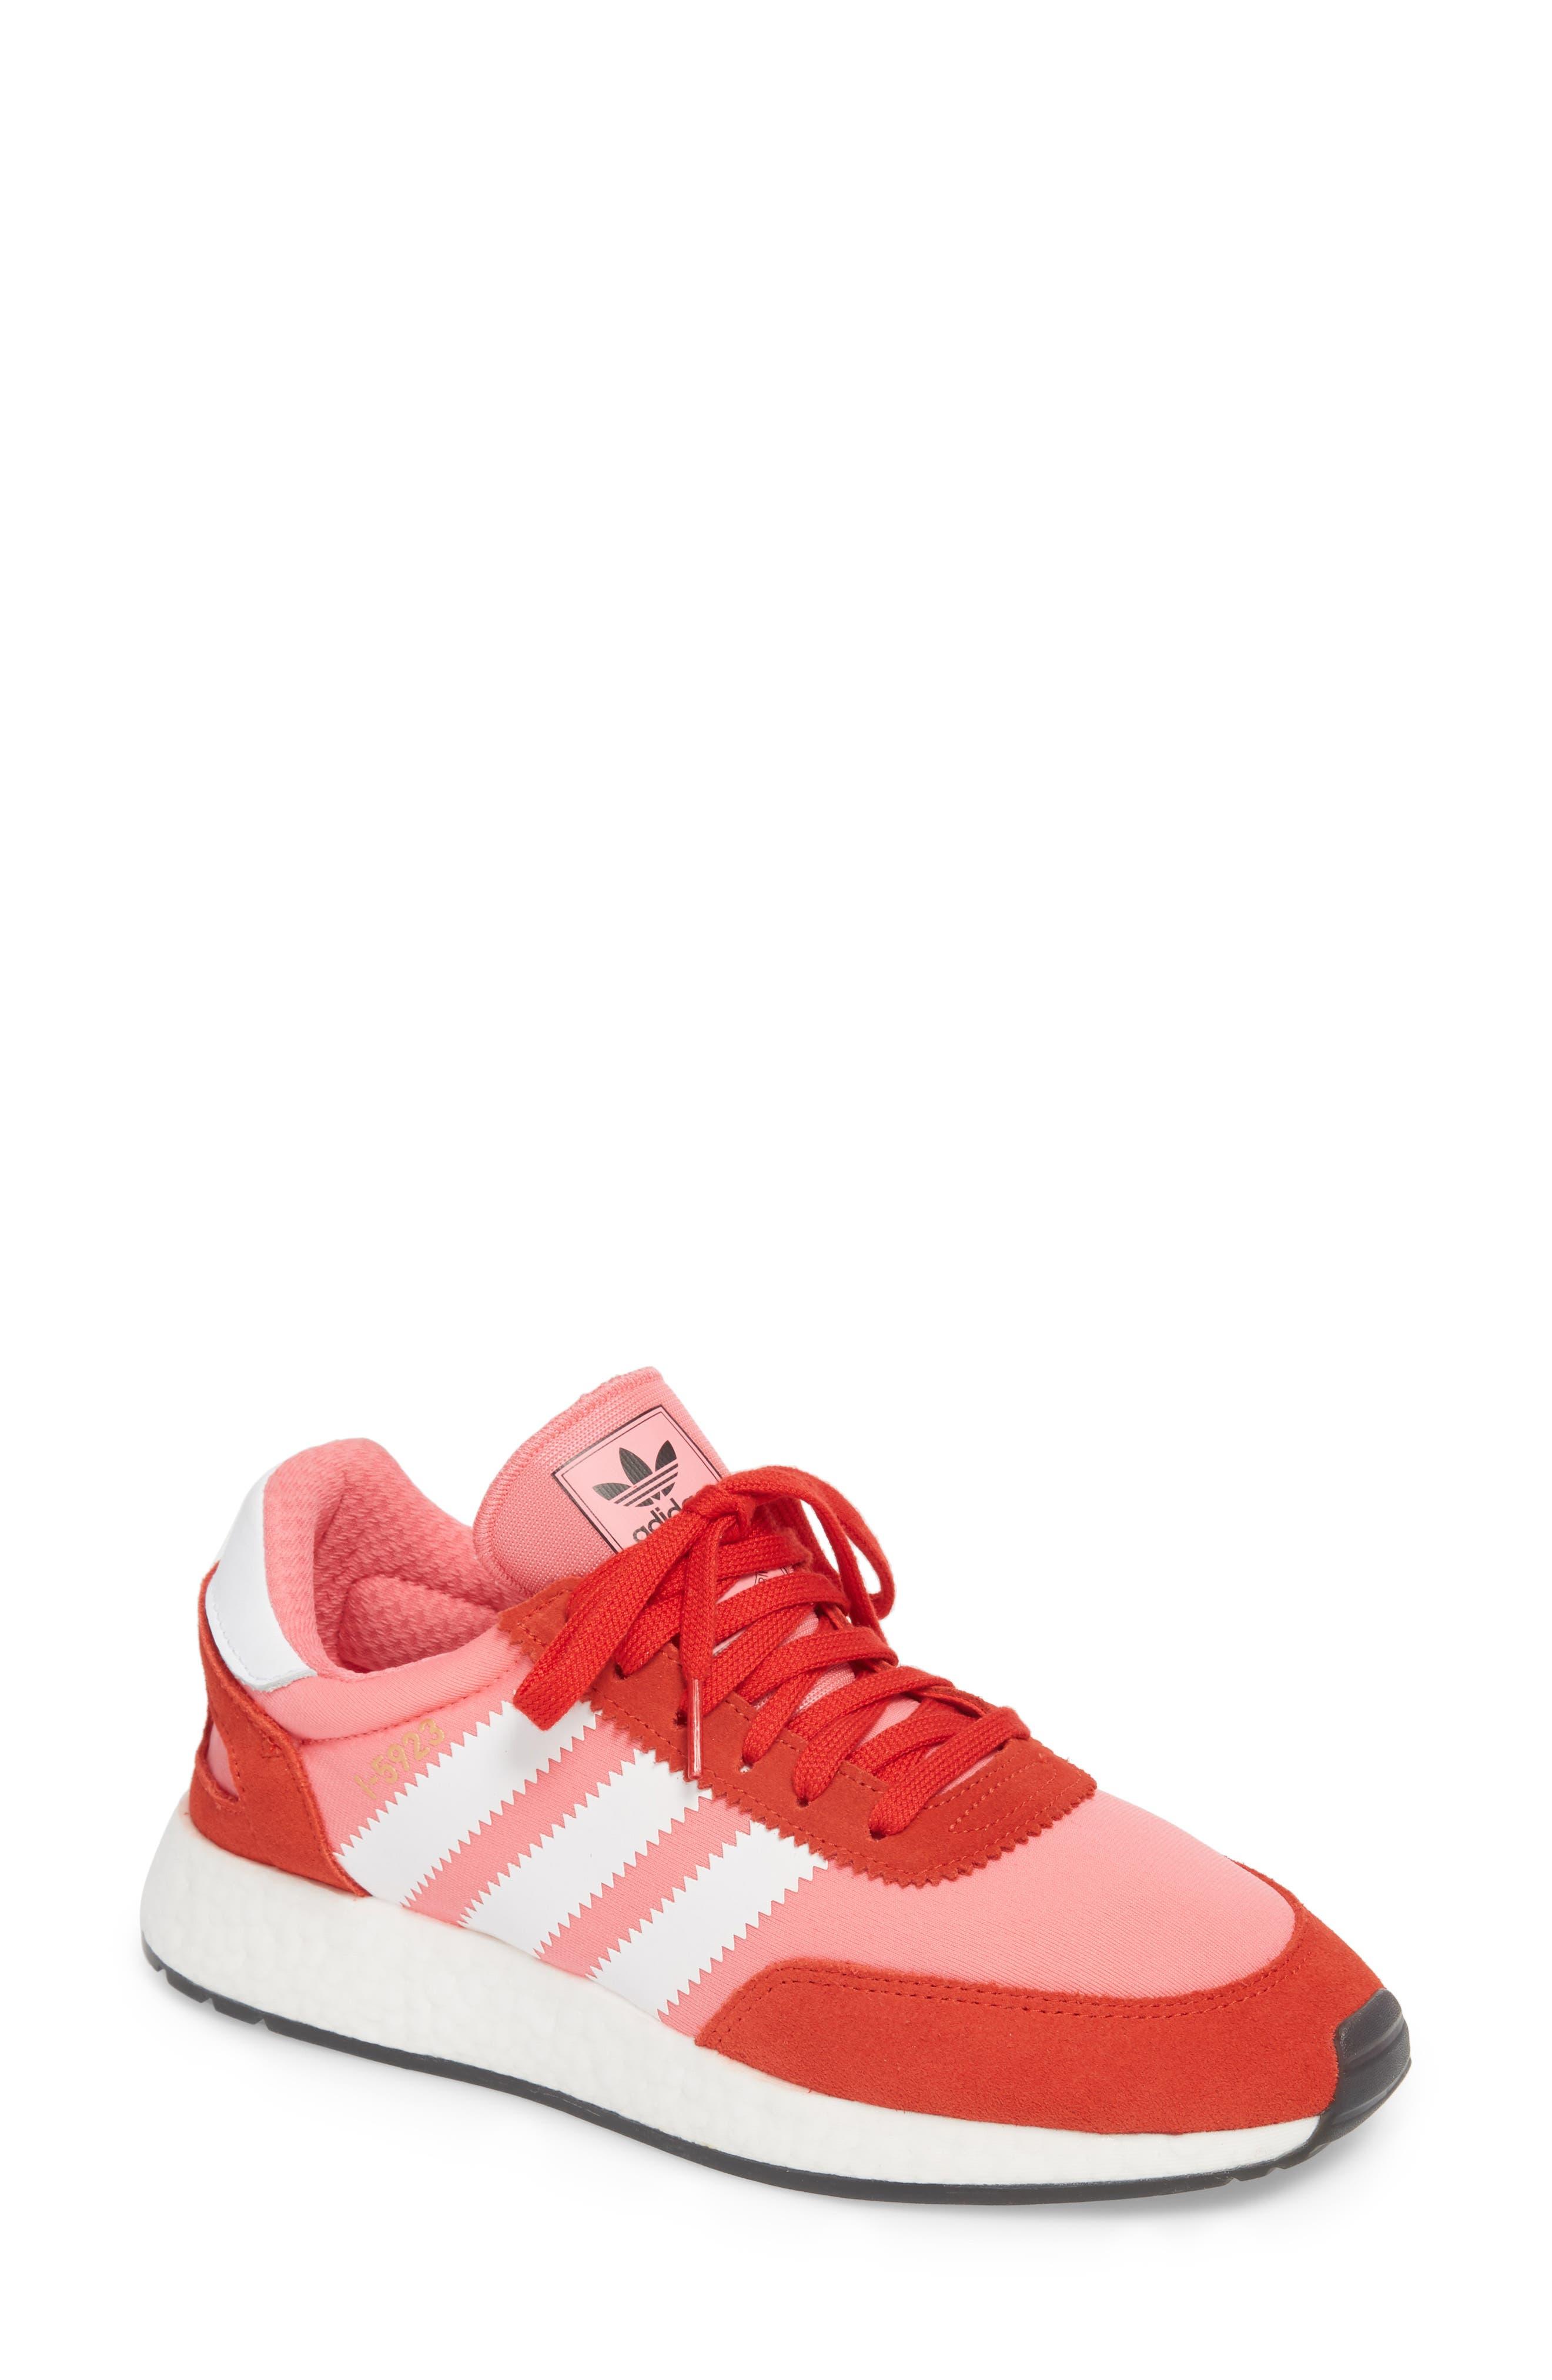 le adidas scarpe rosa nordstrom